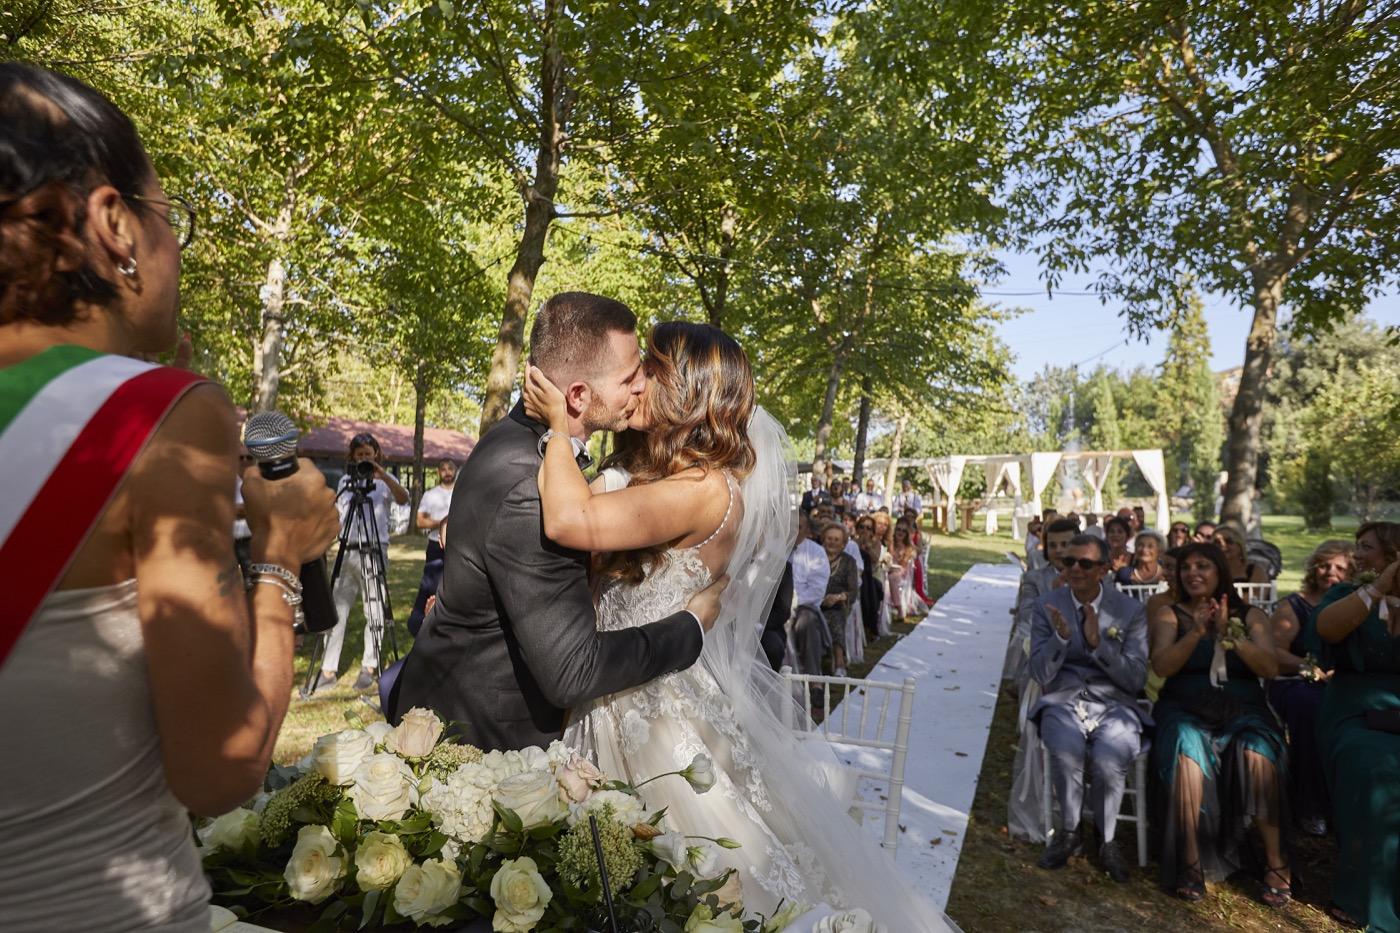 Claudio-Coppola-wedding-photographer-la-scuderia-eventi-preparativi-la-rosetta-perugia-60